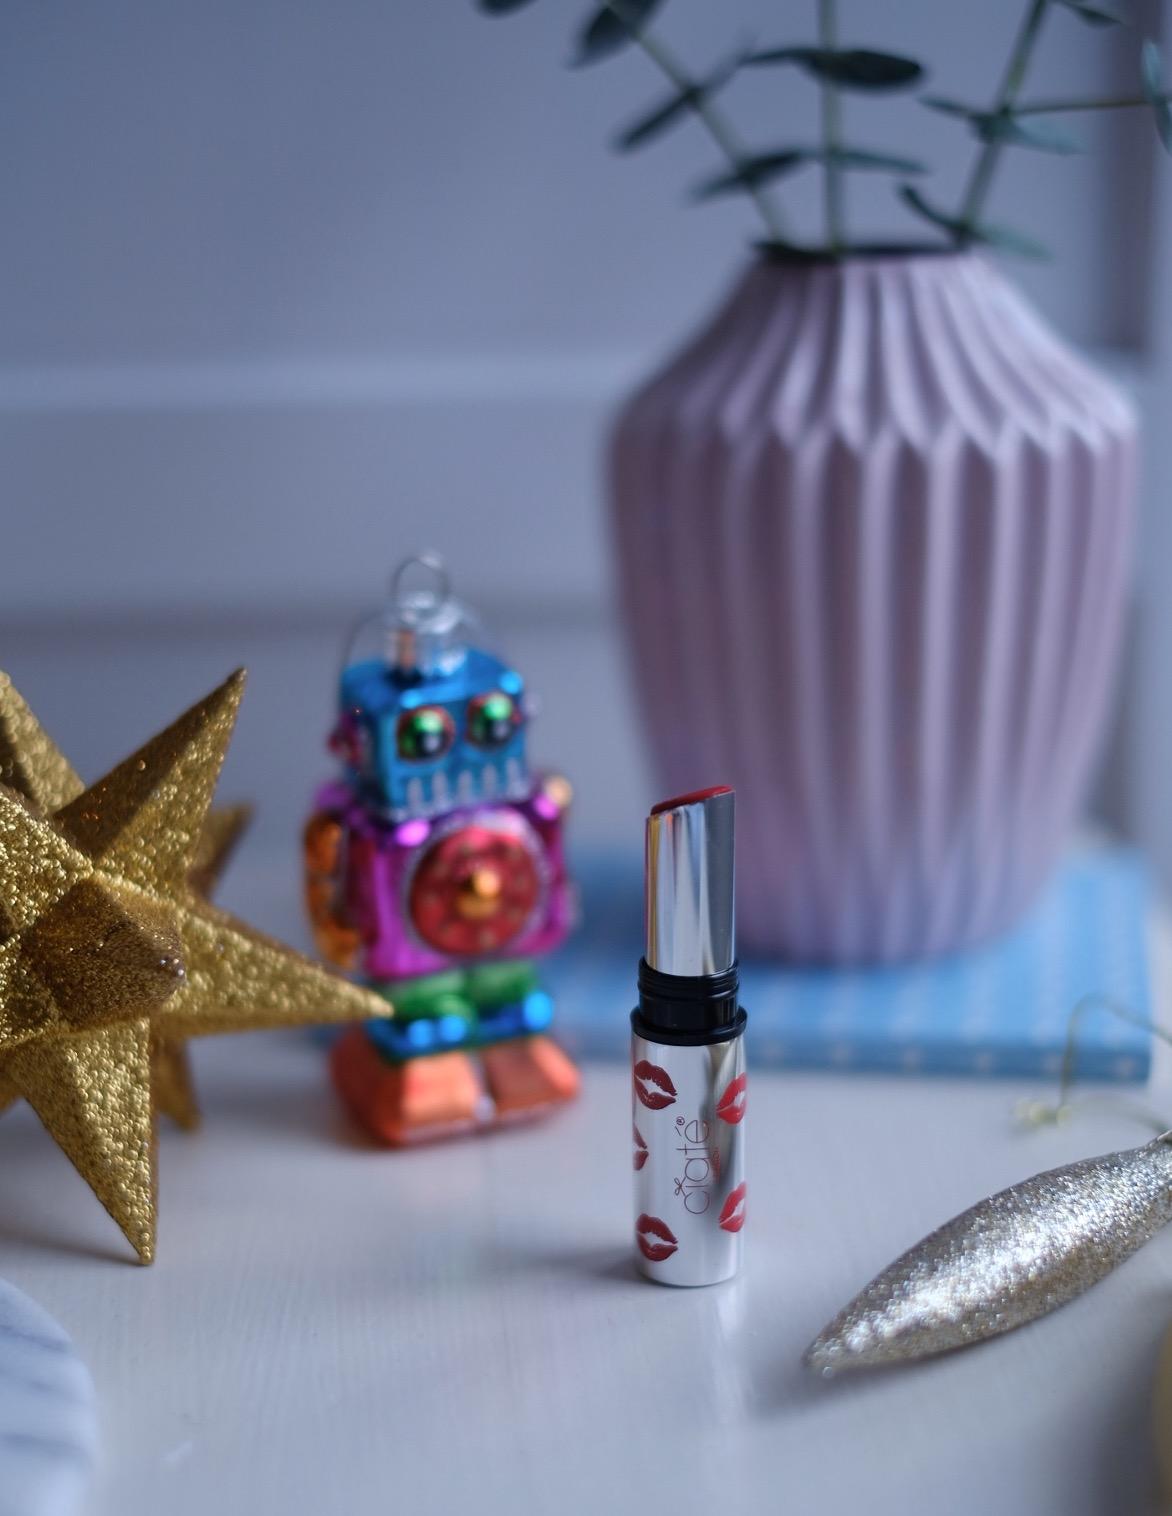 https://www.lookfantastic.com/ciate-london-pretty-stix-lipstick-various-shades/11246719.html